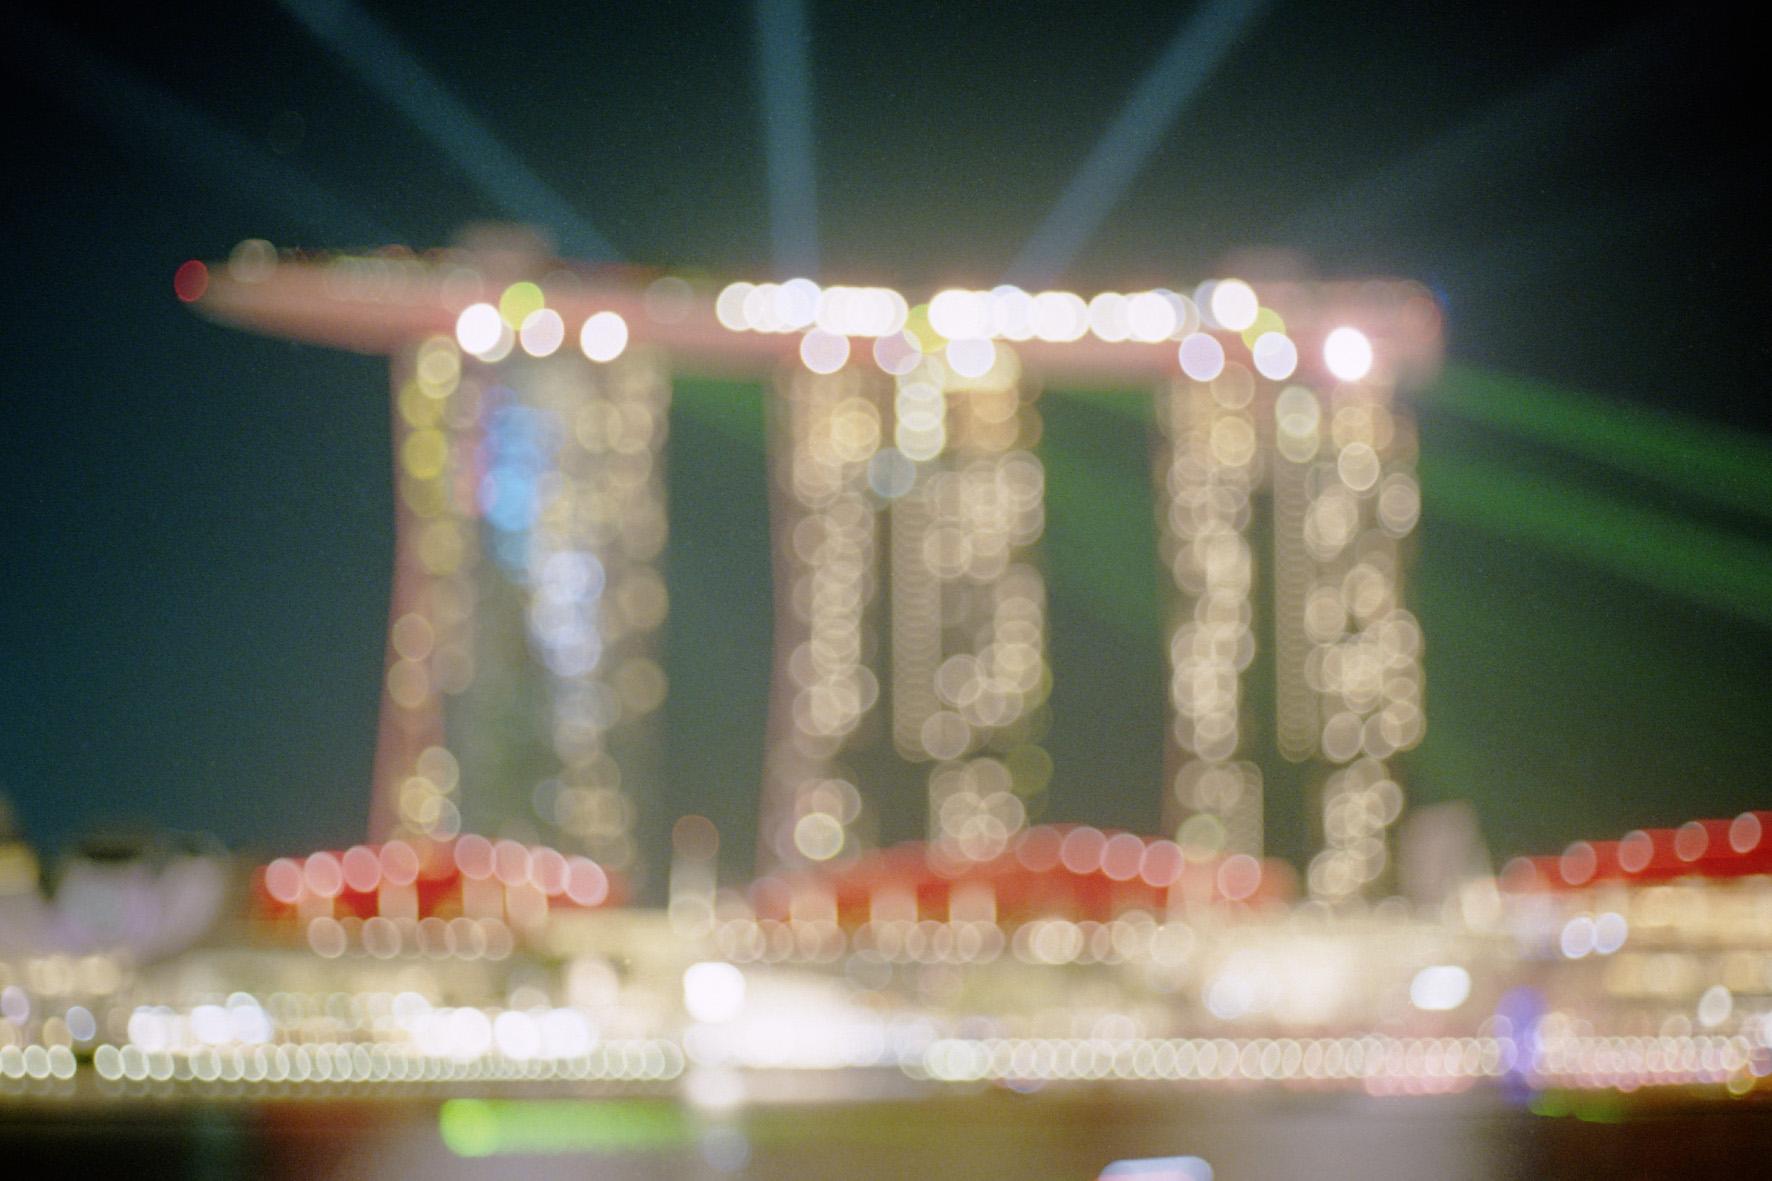 Singapore. Light Pollution. Carlos Alba